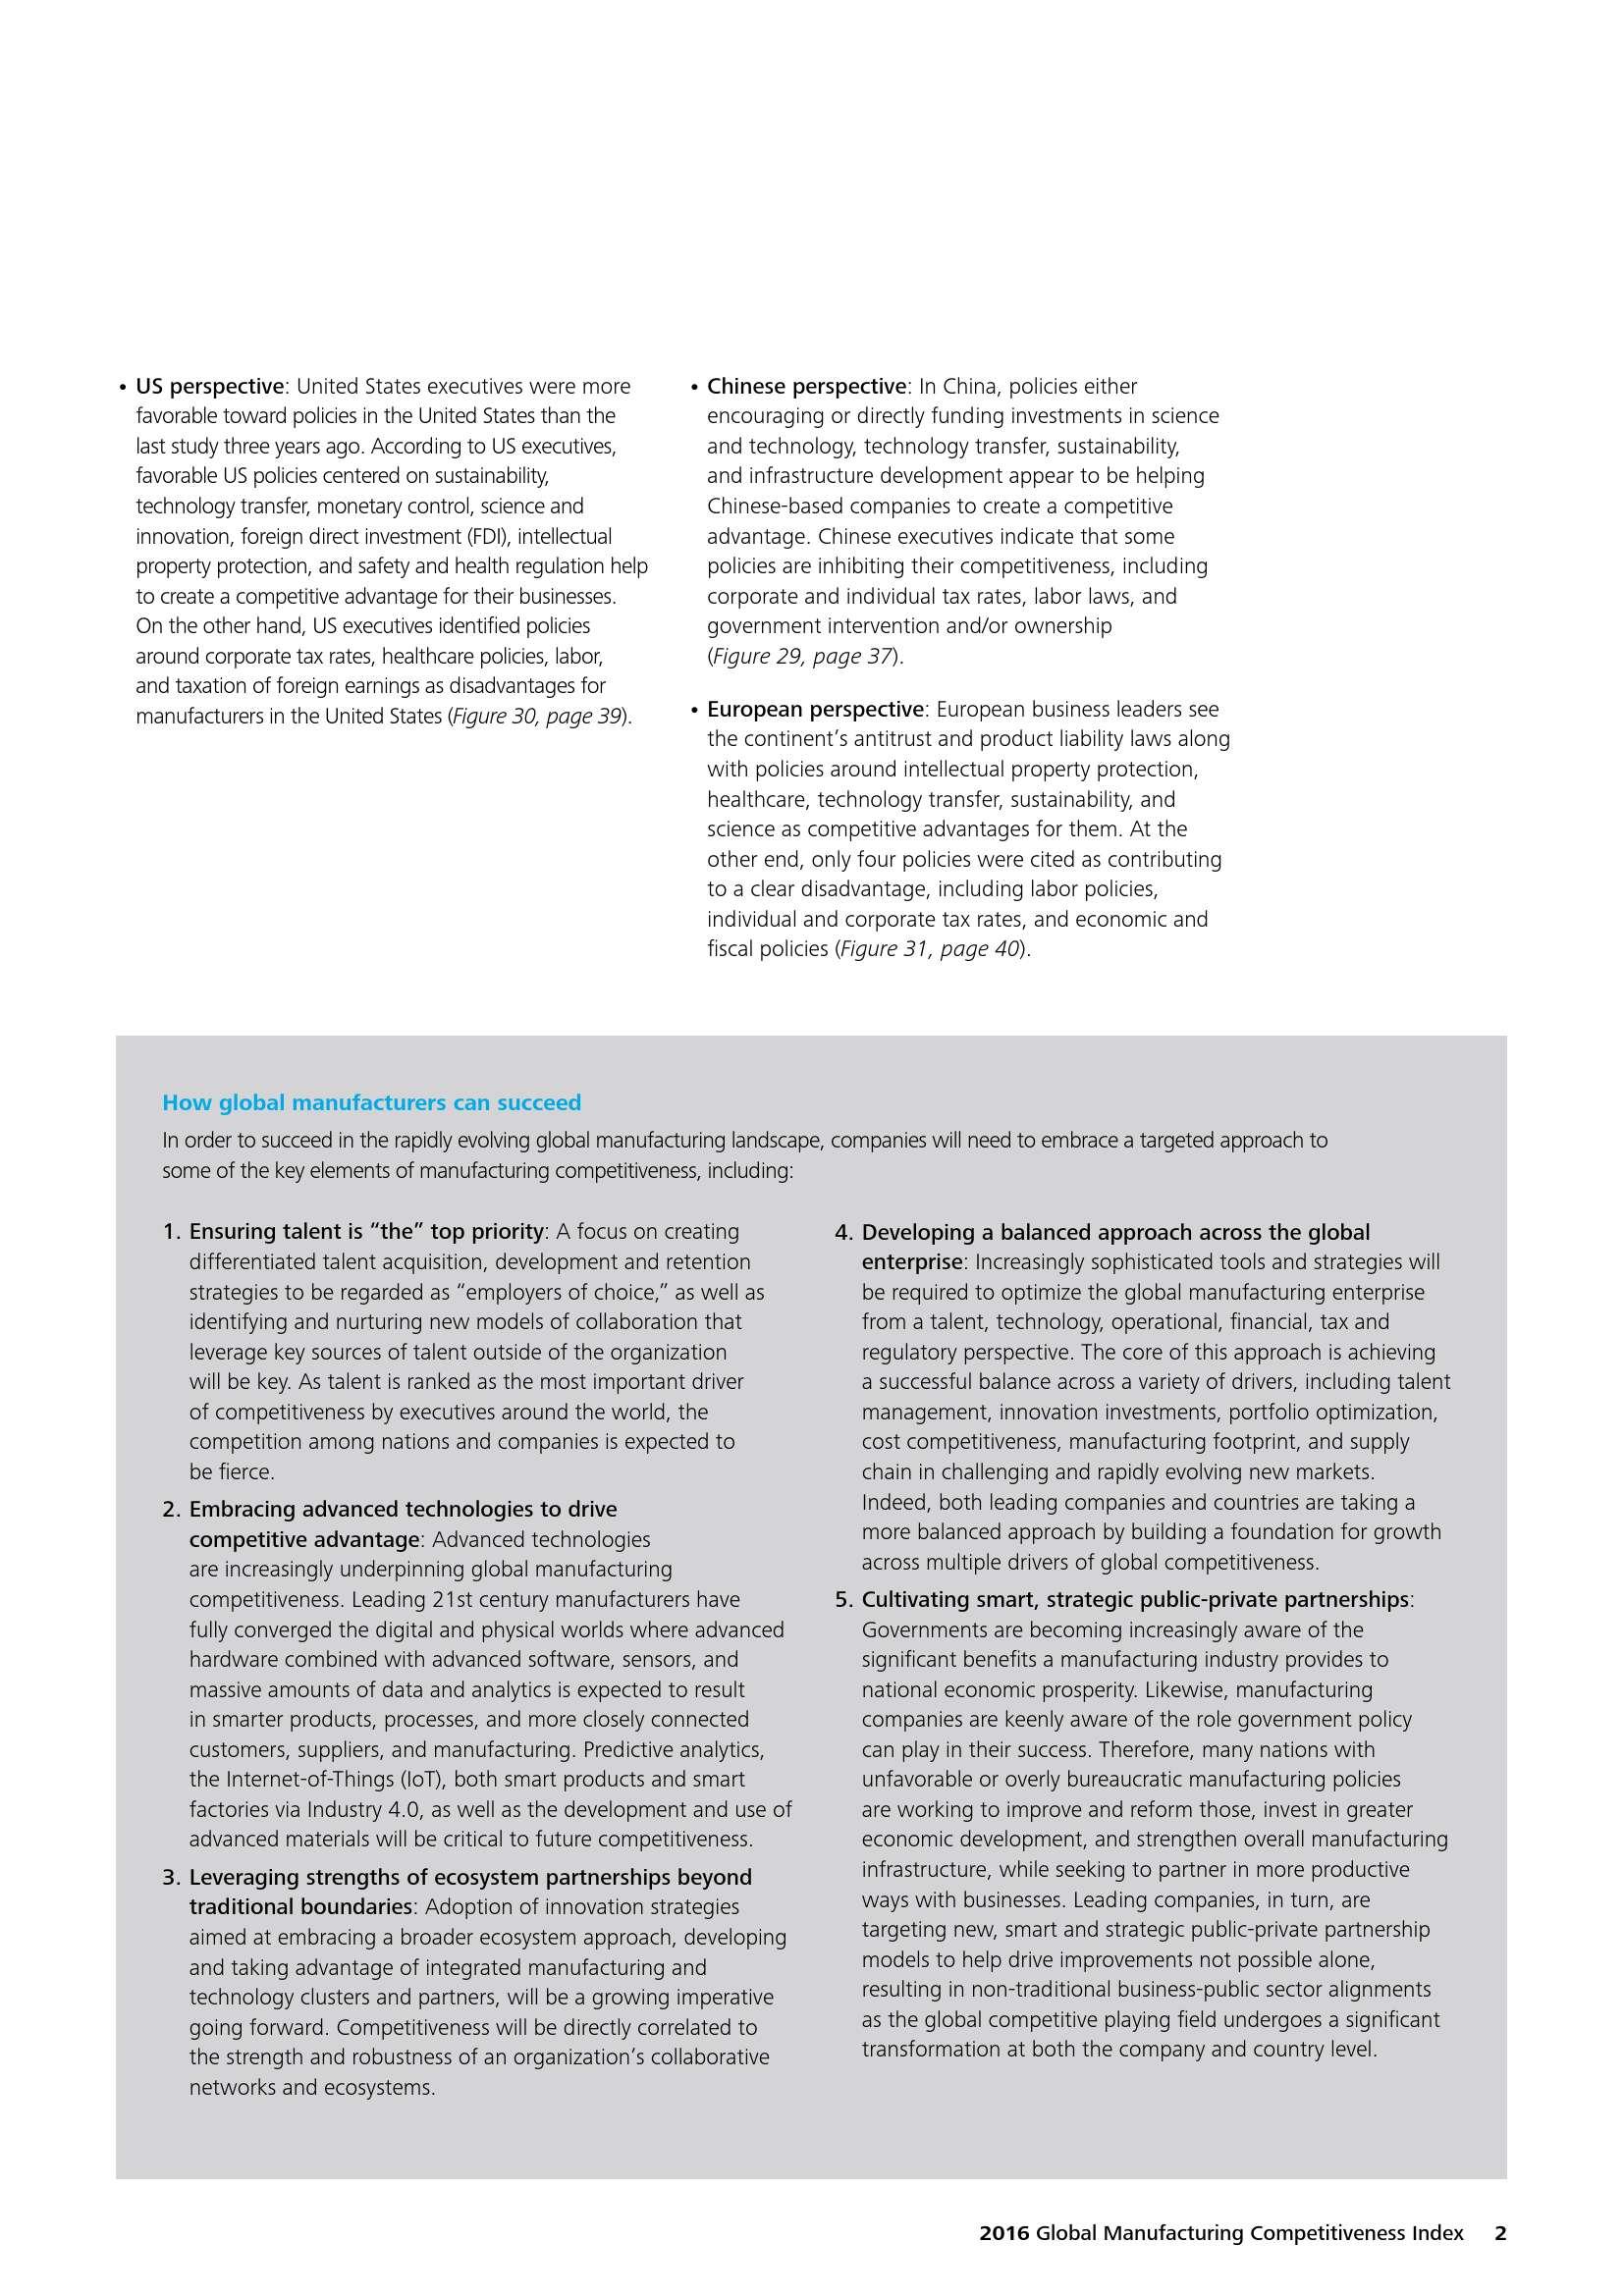 deloitte-cn-global-mfg-competitiveness-index-2016-en-160401_000005